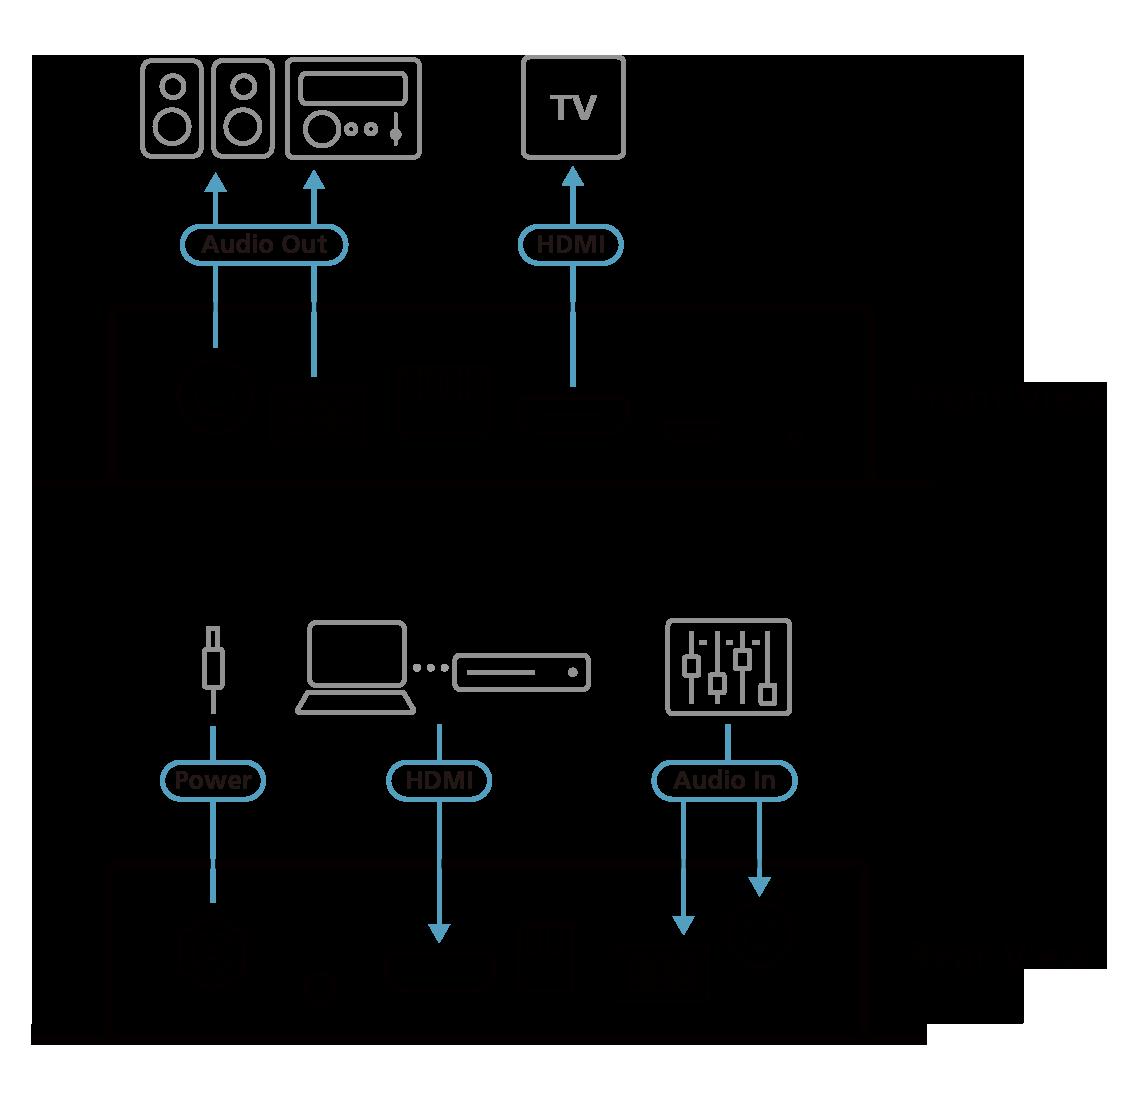 VC882 Diagram